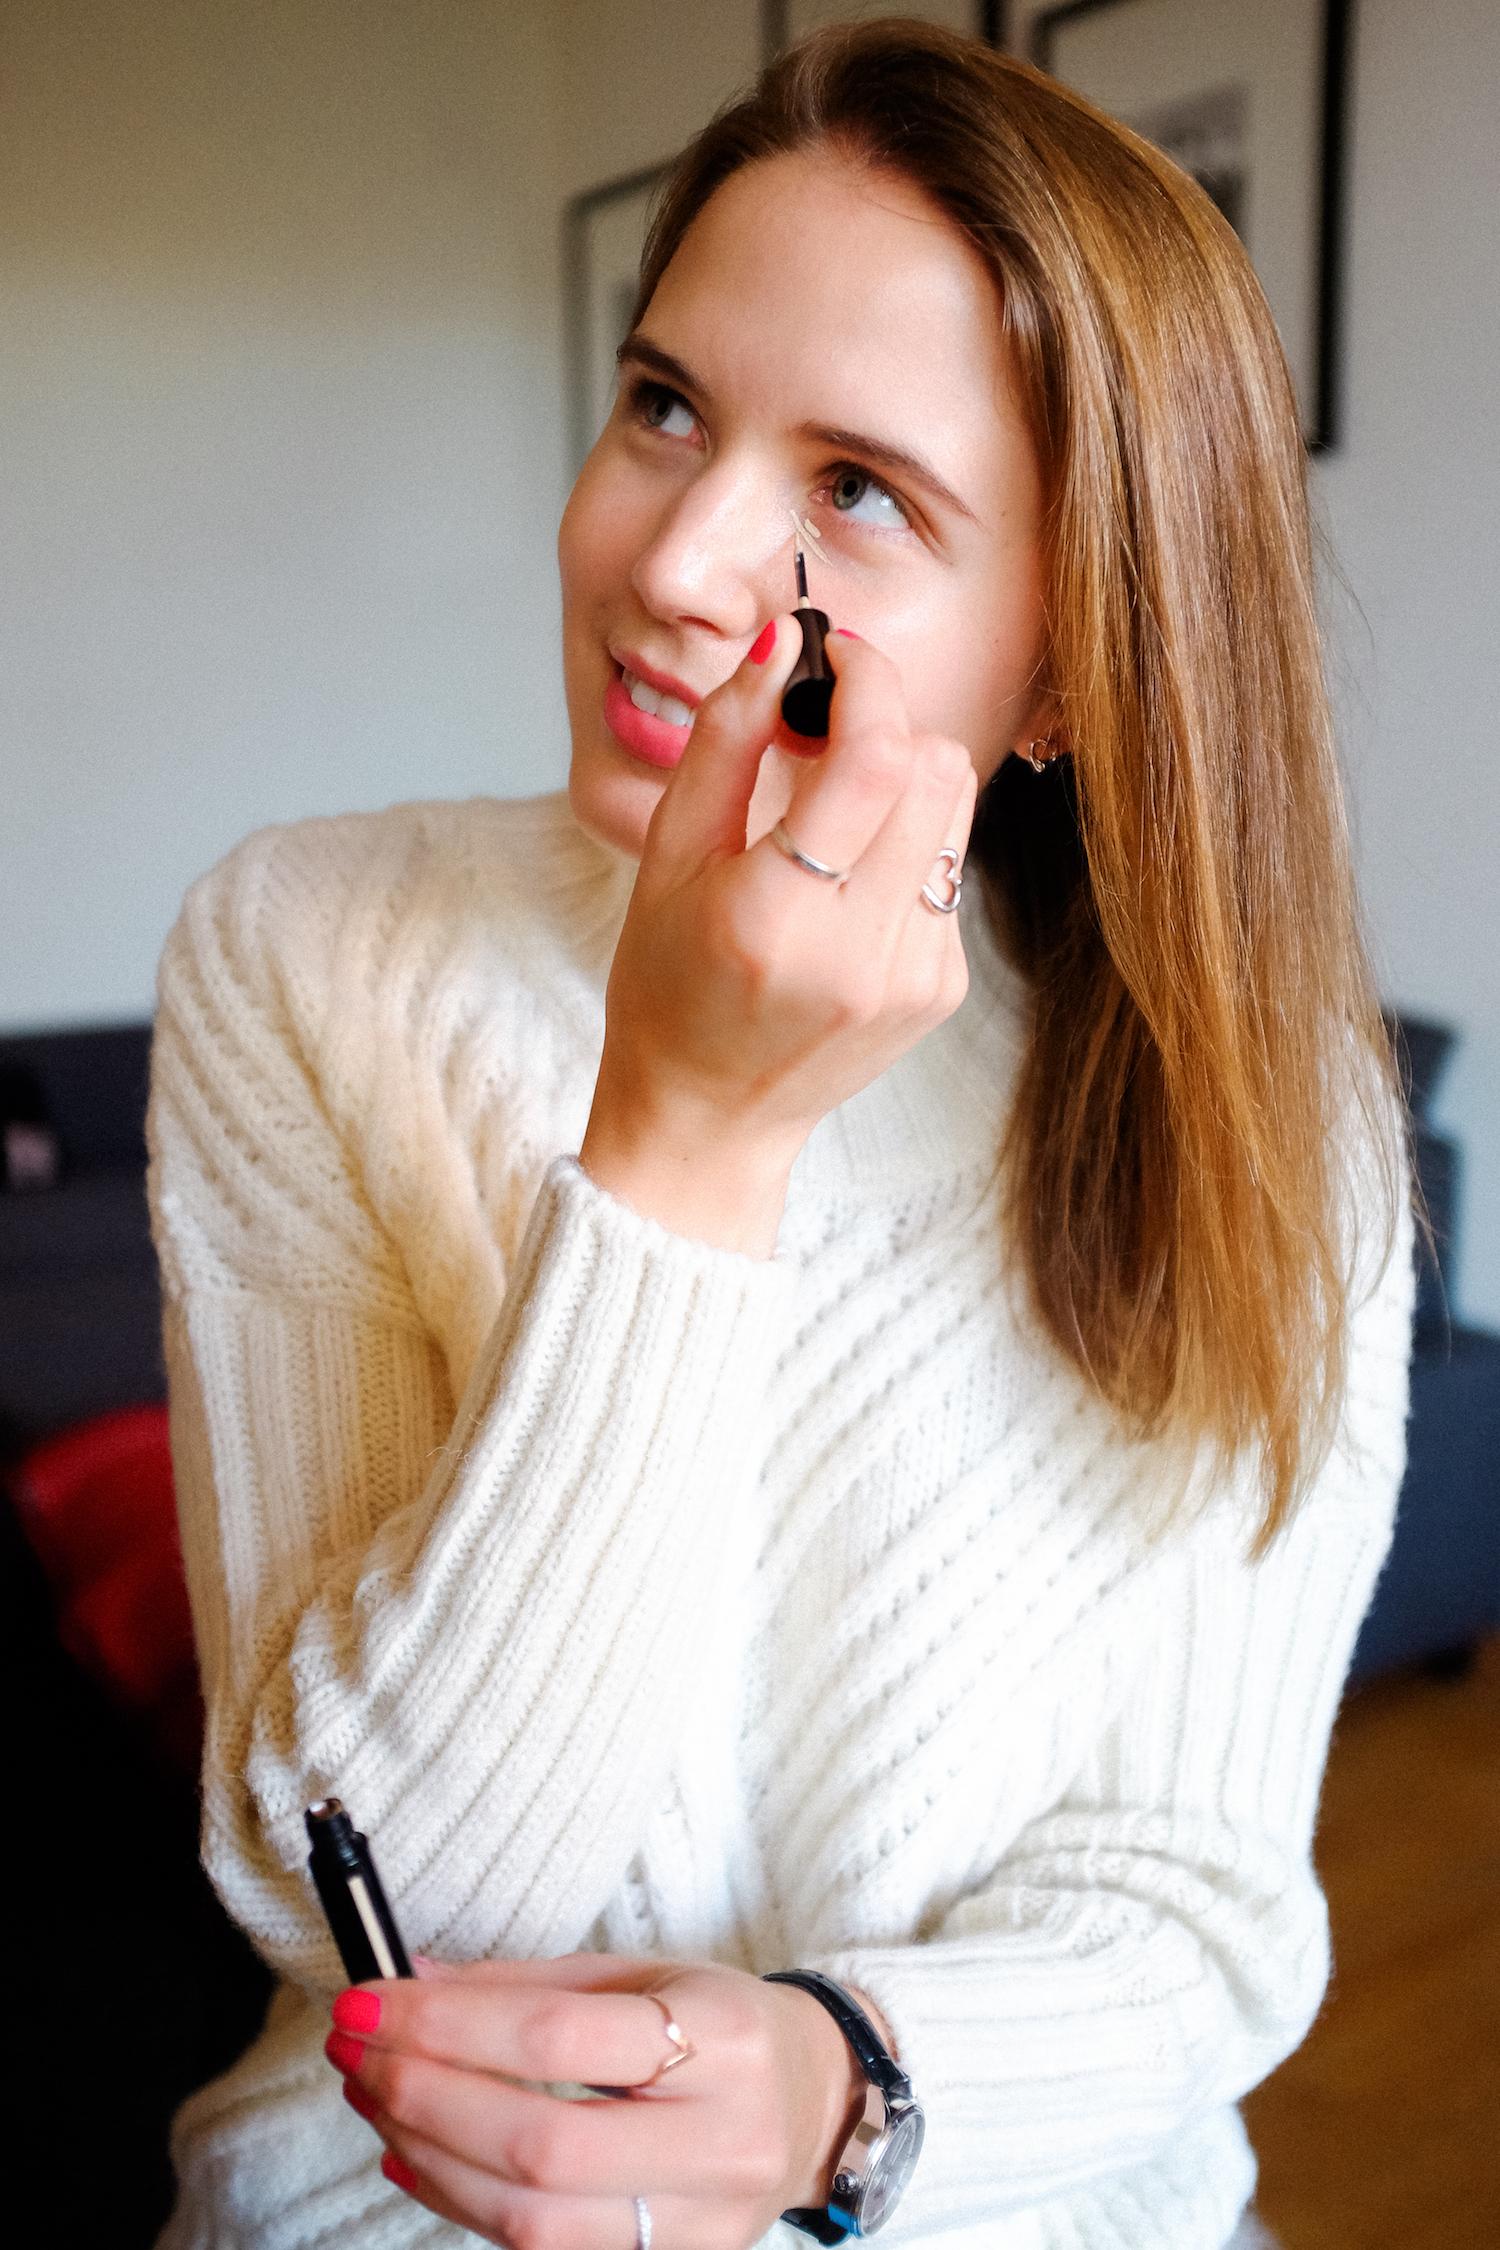 suelovesnyc_susan_fengler_armani_beauty_makeup_no_mirror_challenge_wochen_challenge_fabijan_vuksic_hochzeitsfotograf_hamburg_sue-8